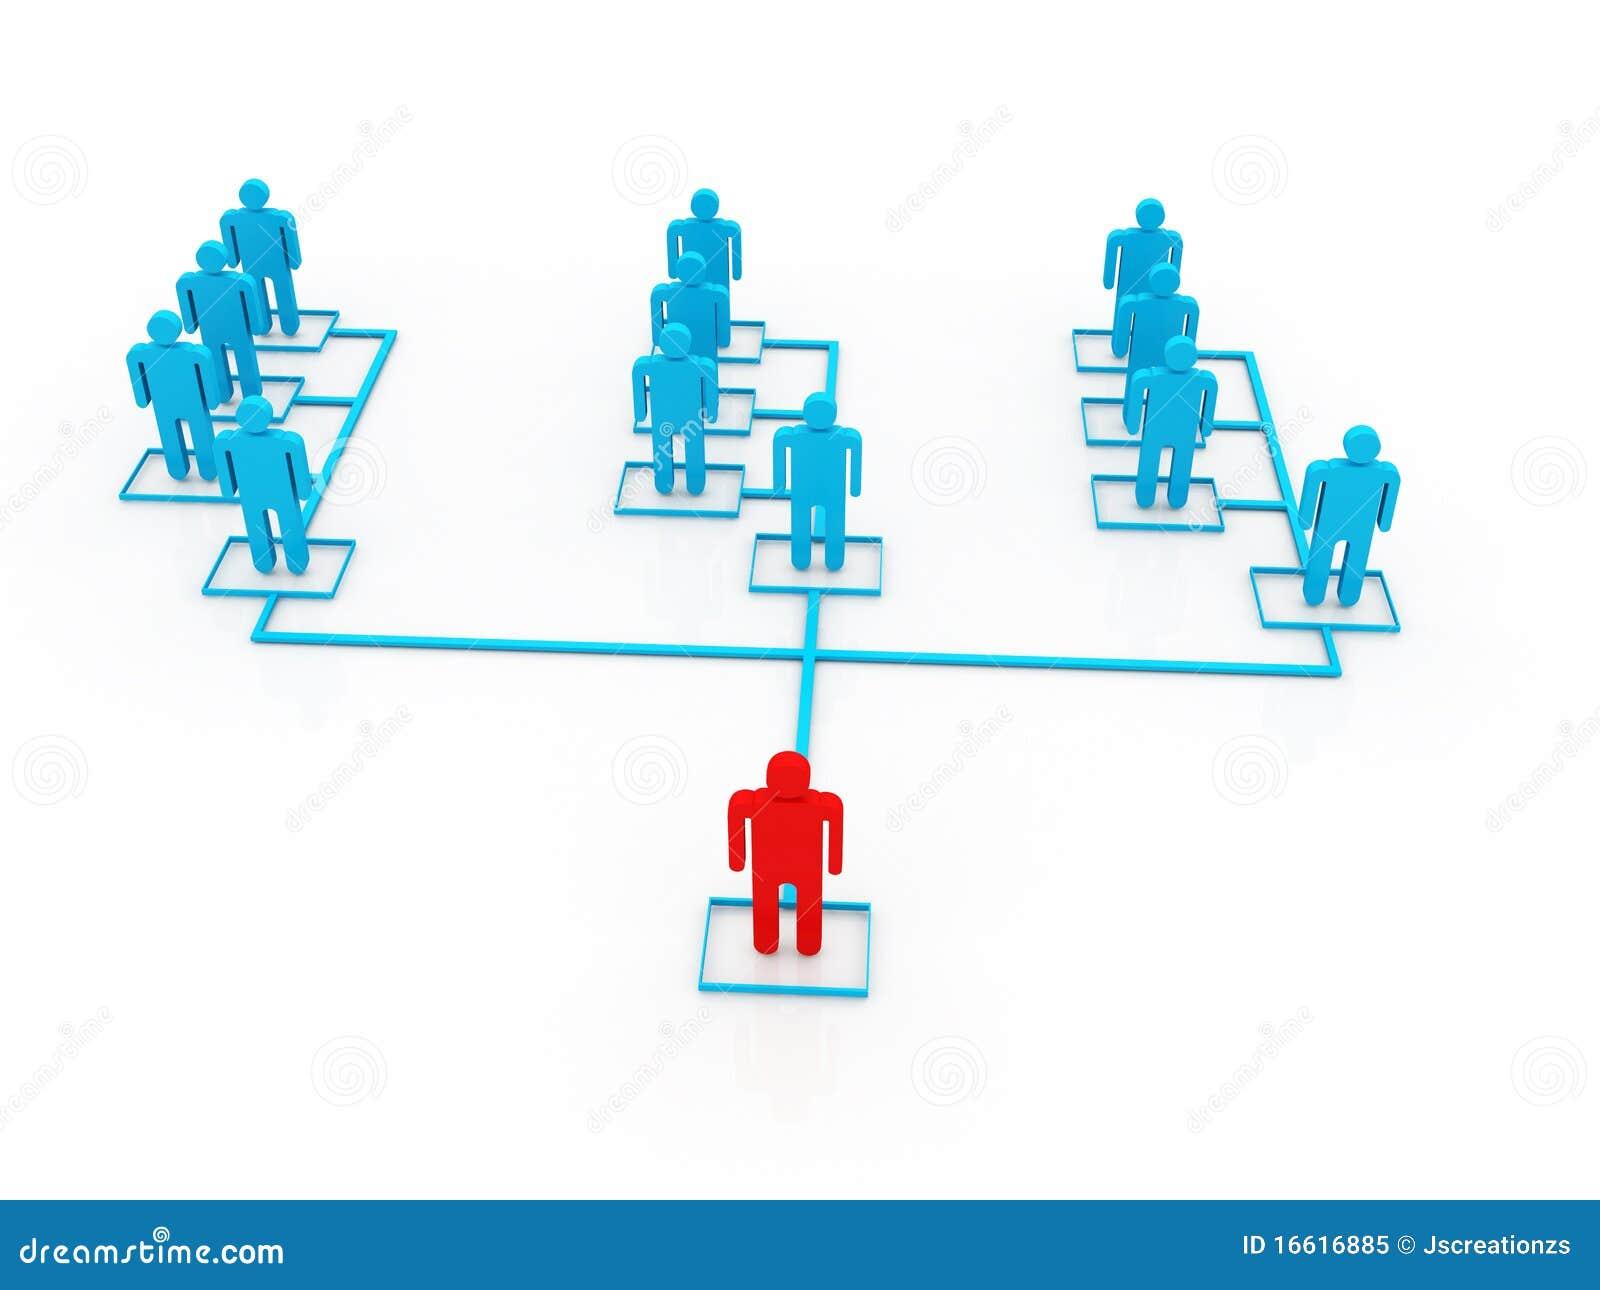 Team Leader Royalty Free Stock Photo - Image: 16616885: dreamstime.com/royalty-free-stock-photo-team-leader-image16616885